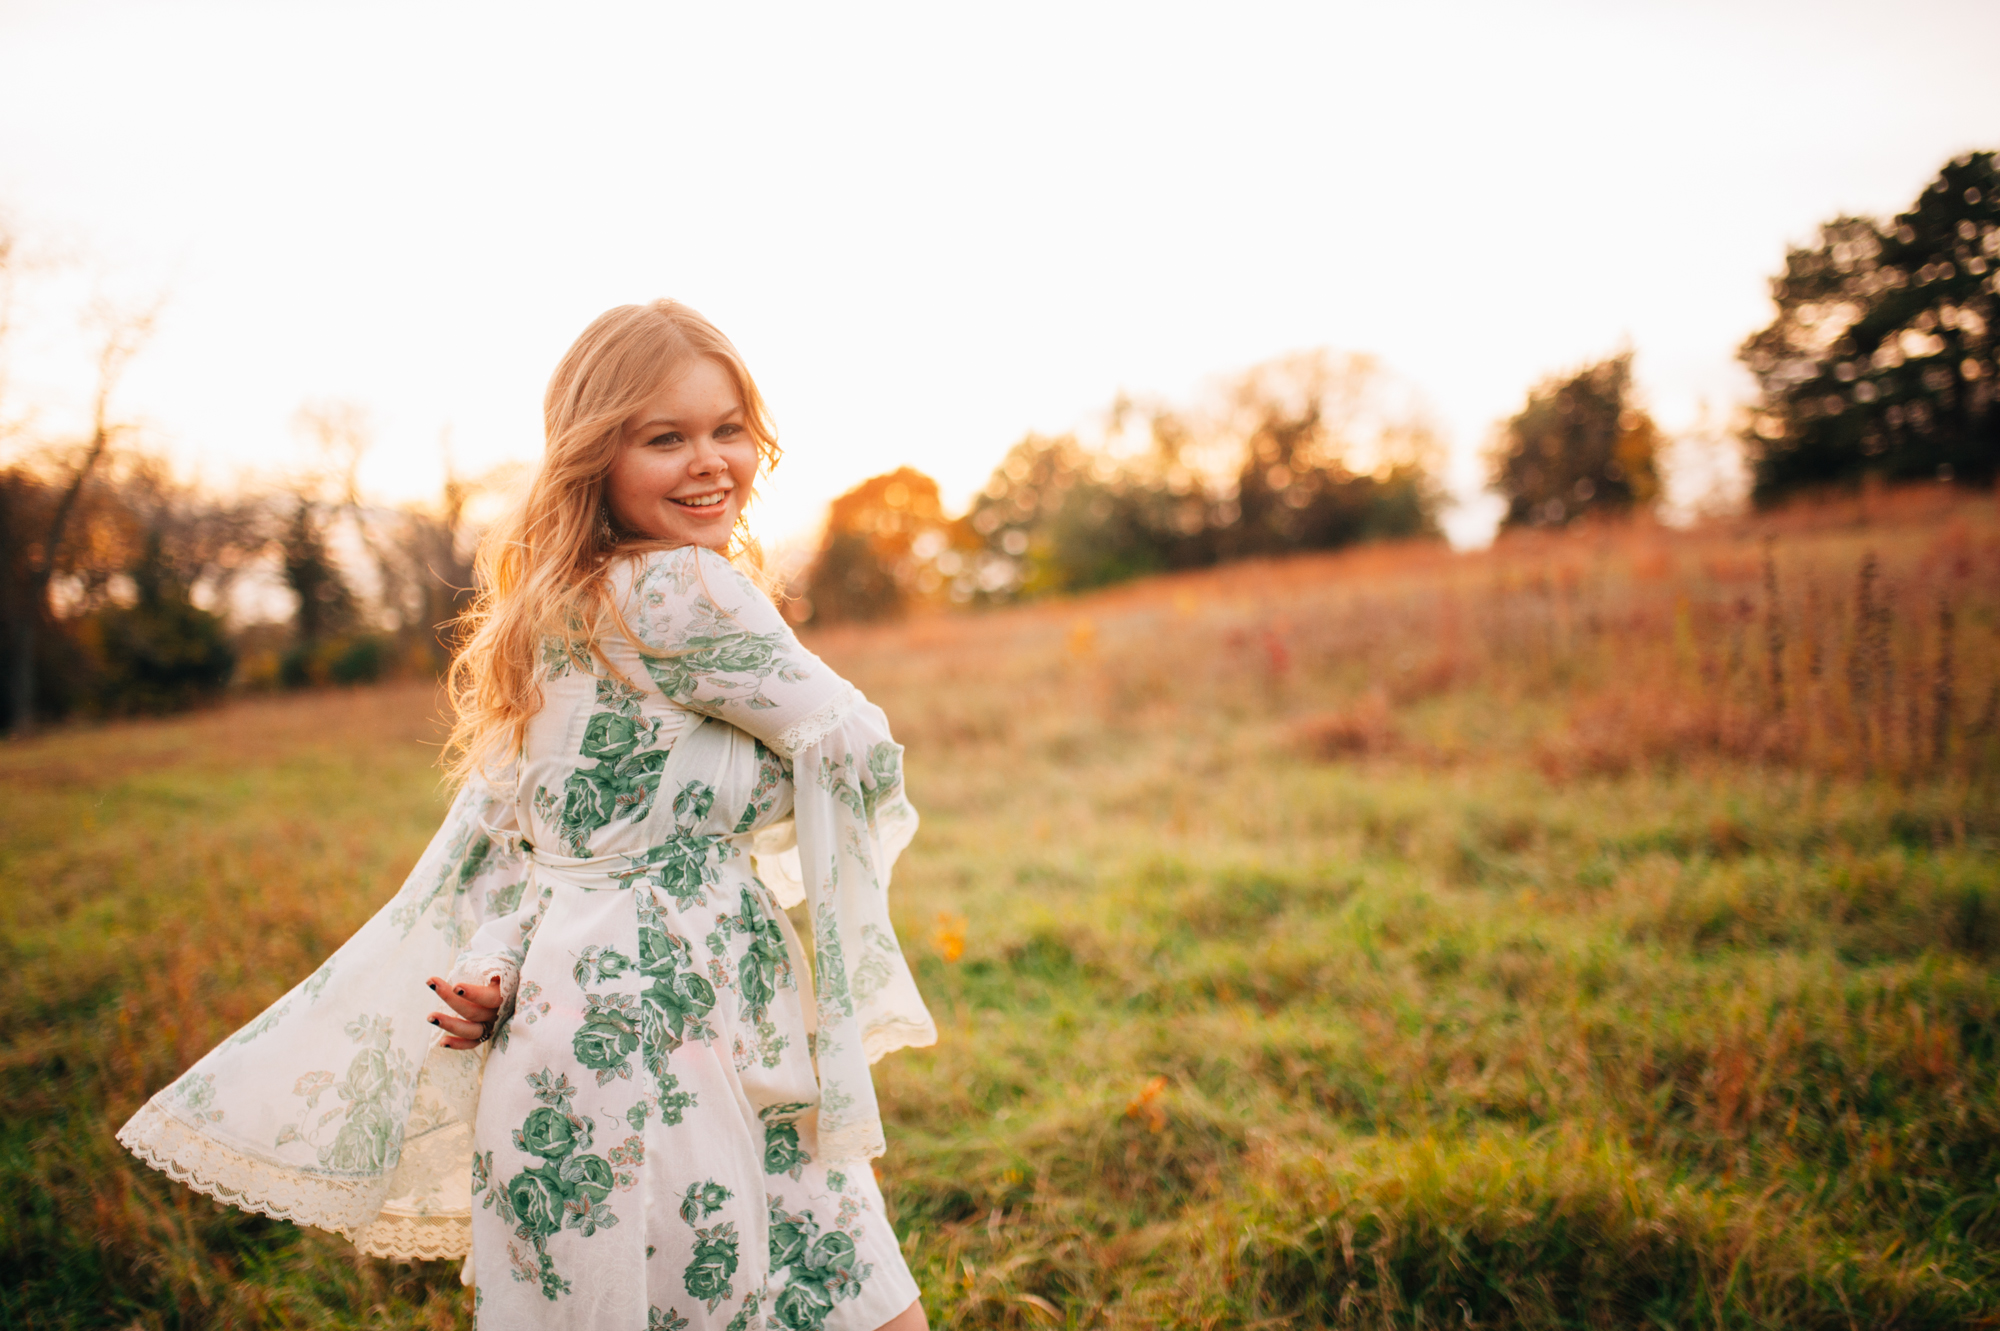 Flower child high school senior photo session in Lincoln, Nebraska by Tara Polly Photography.